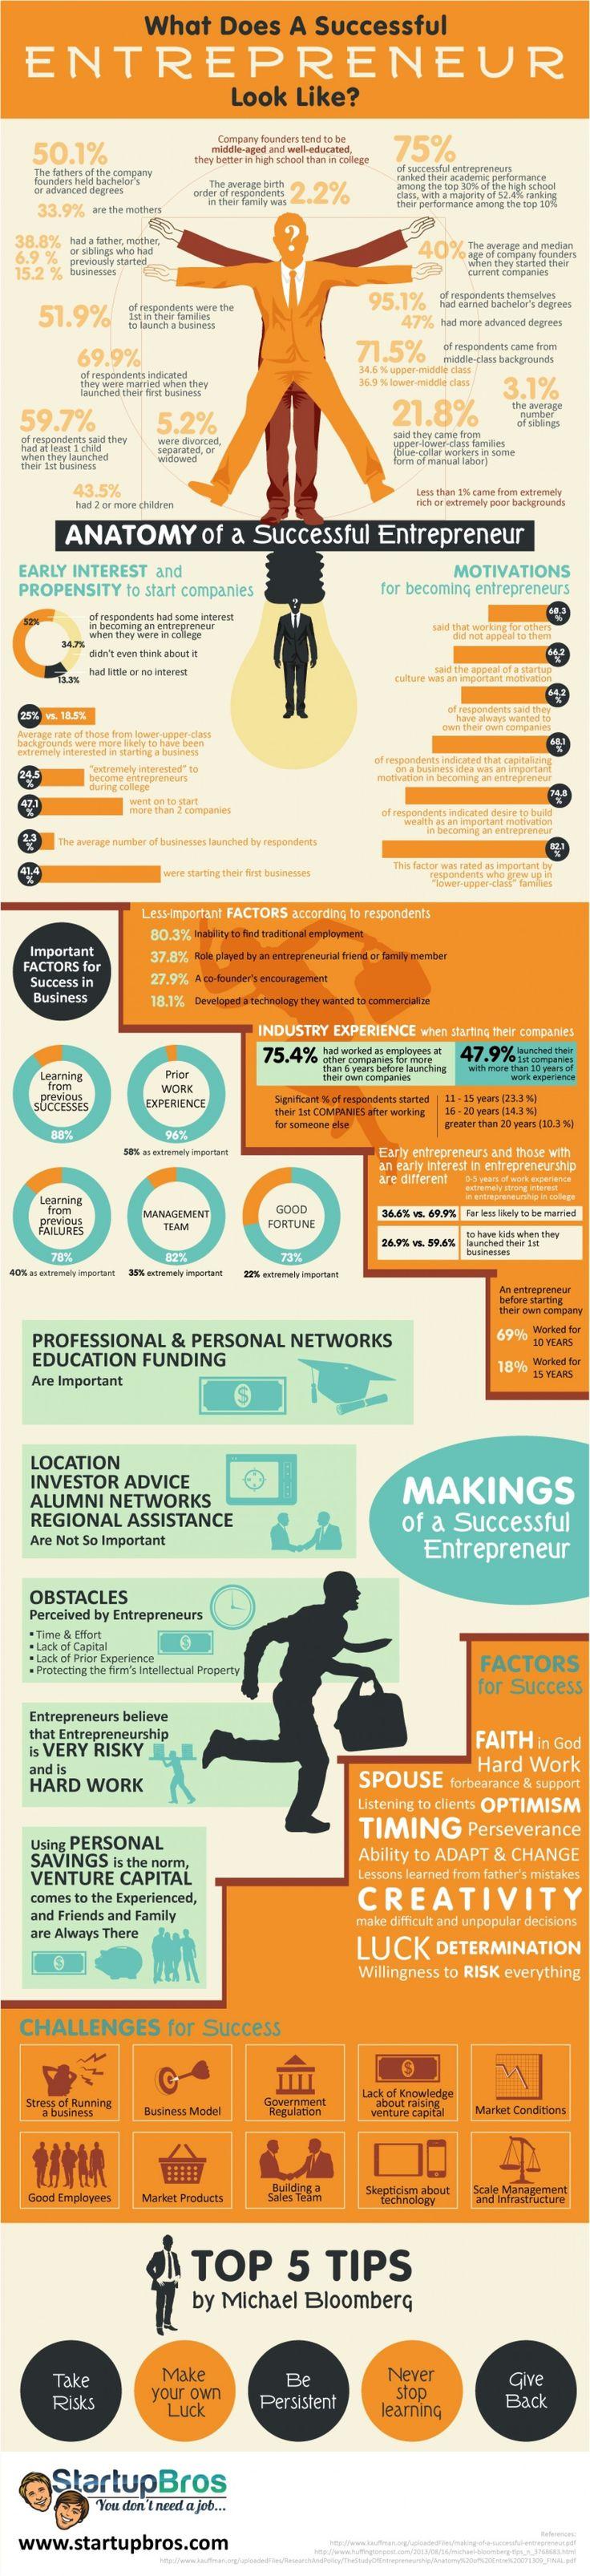 What Does A Successful #Entrepreneur Look Like? #startups #smallbiz www.sourcepep.com/80-20-blog/